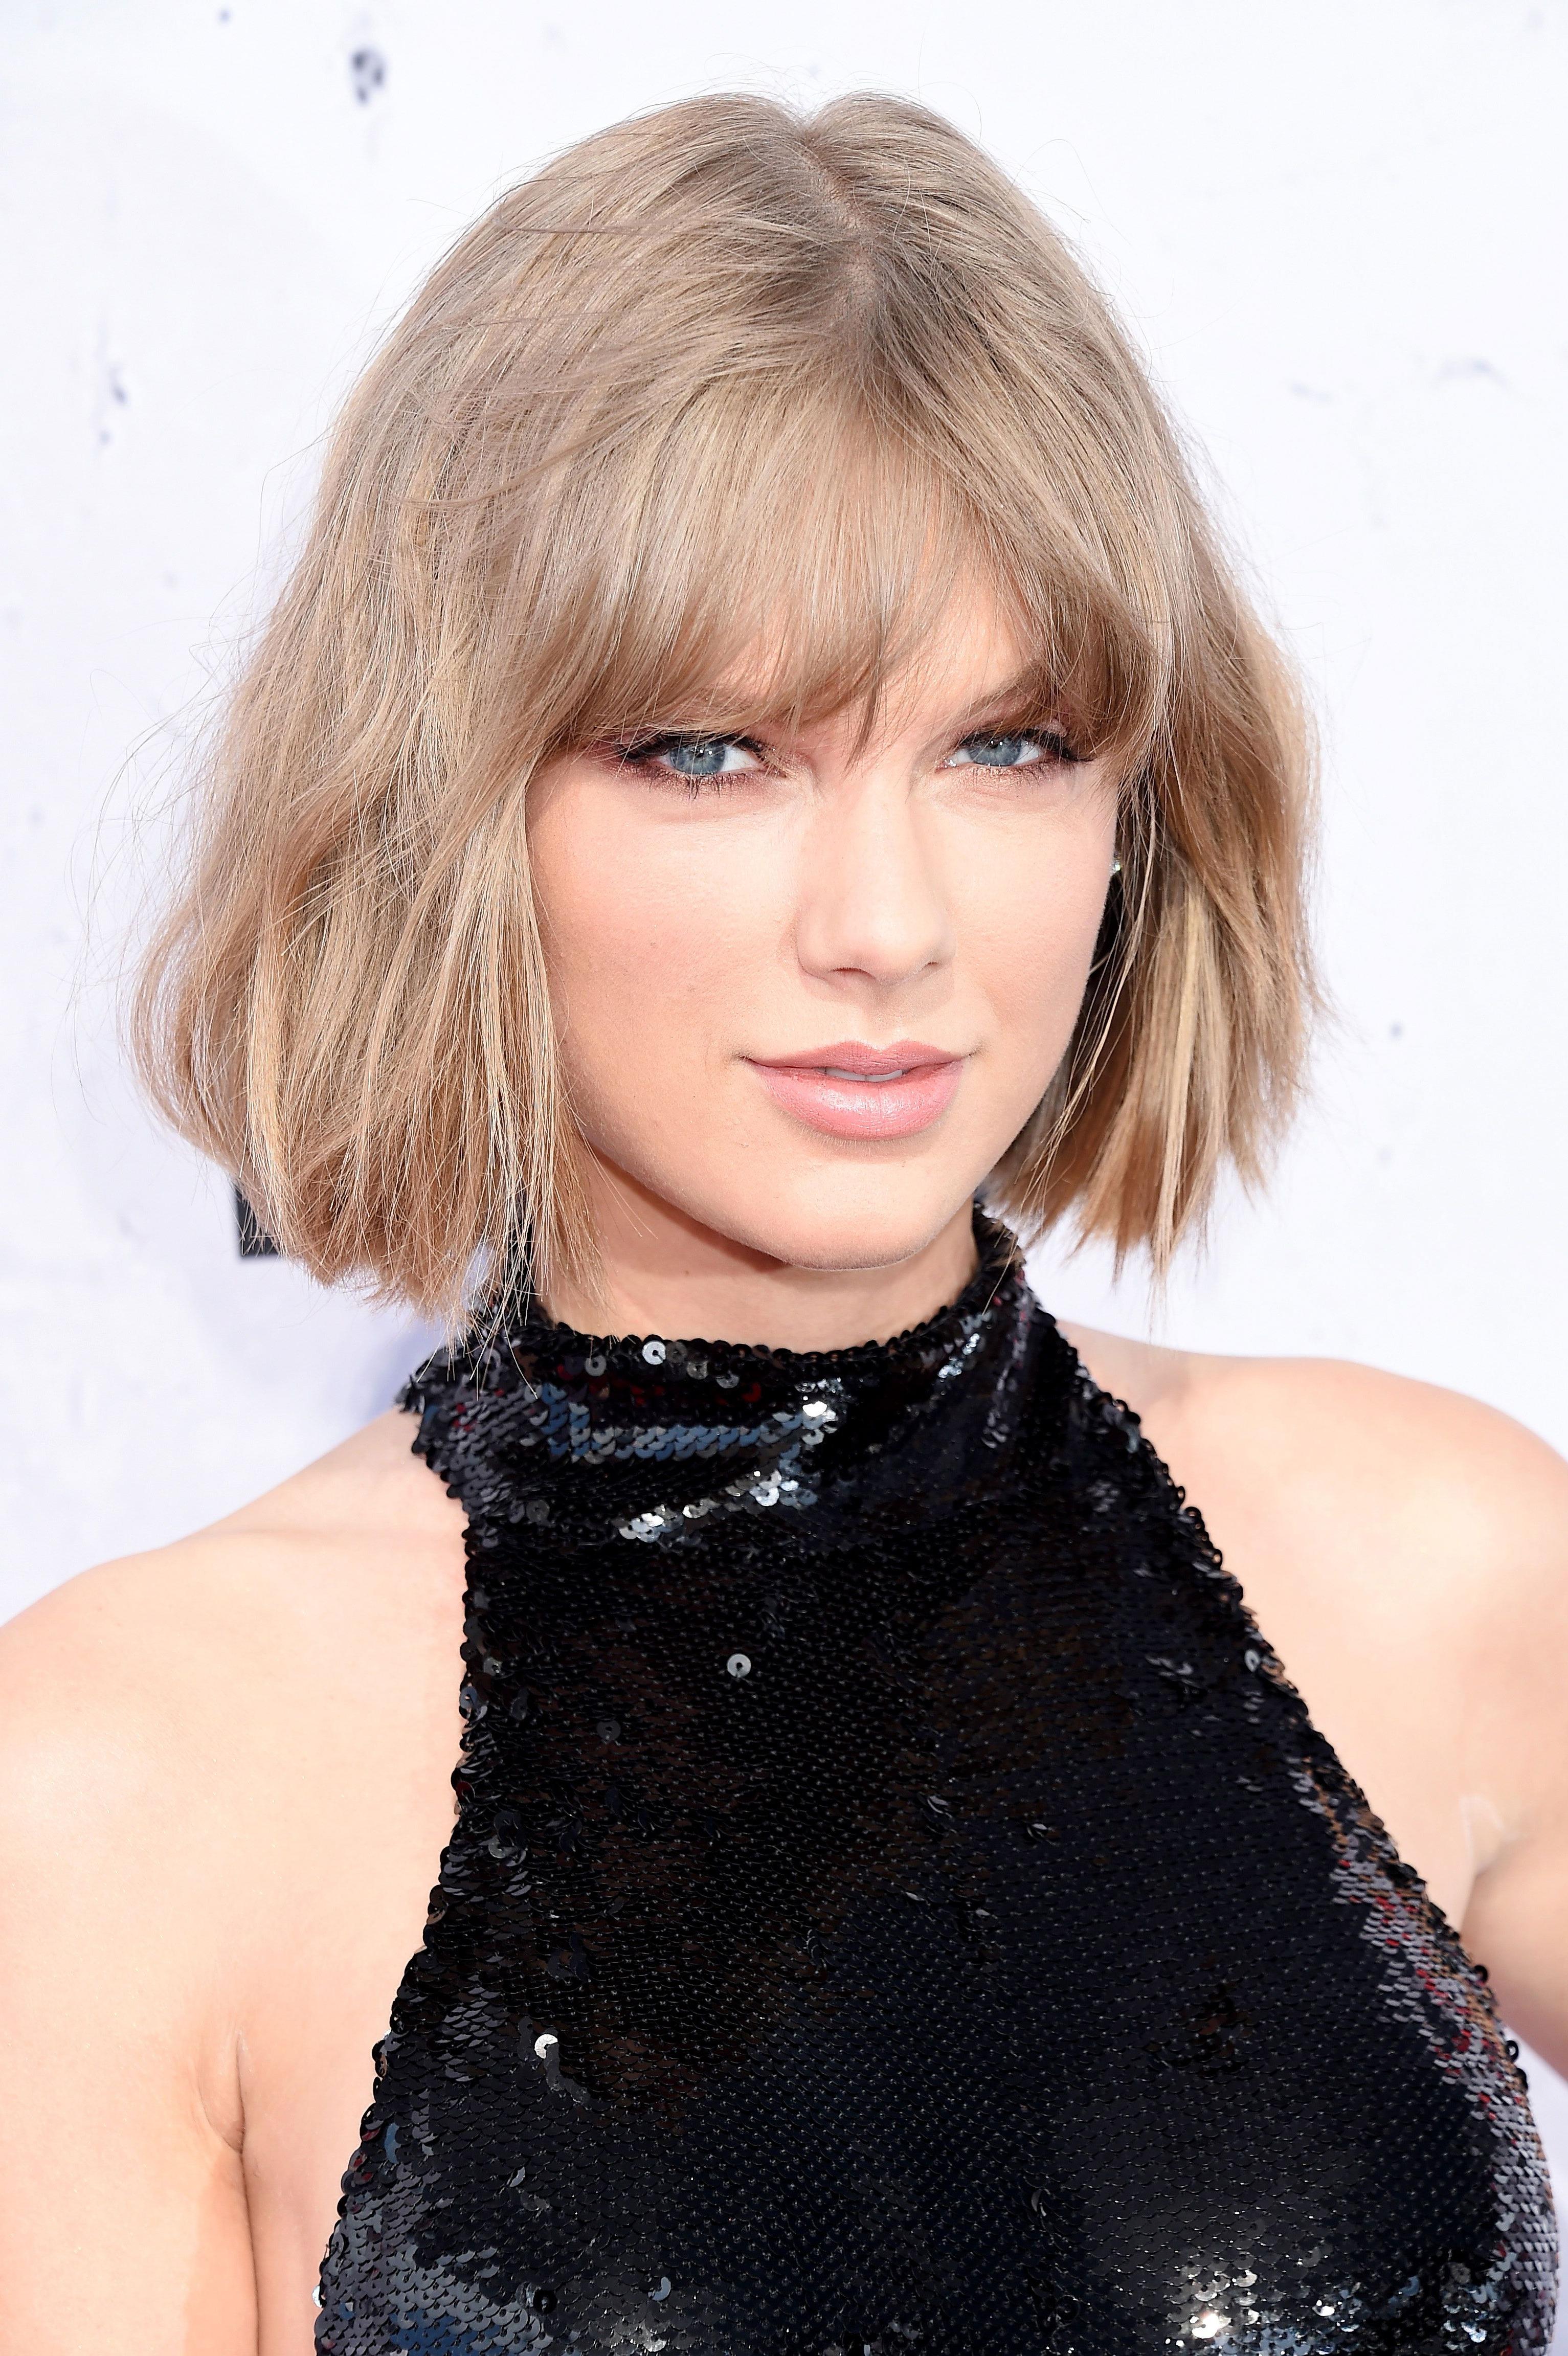 16 Ash Blonde Hair Color Ideas – Ash Blonde Celebrity Hairstyles For Ash Blonde Short Hairstyles (View 18 of 25)